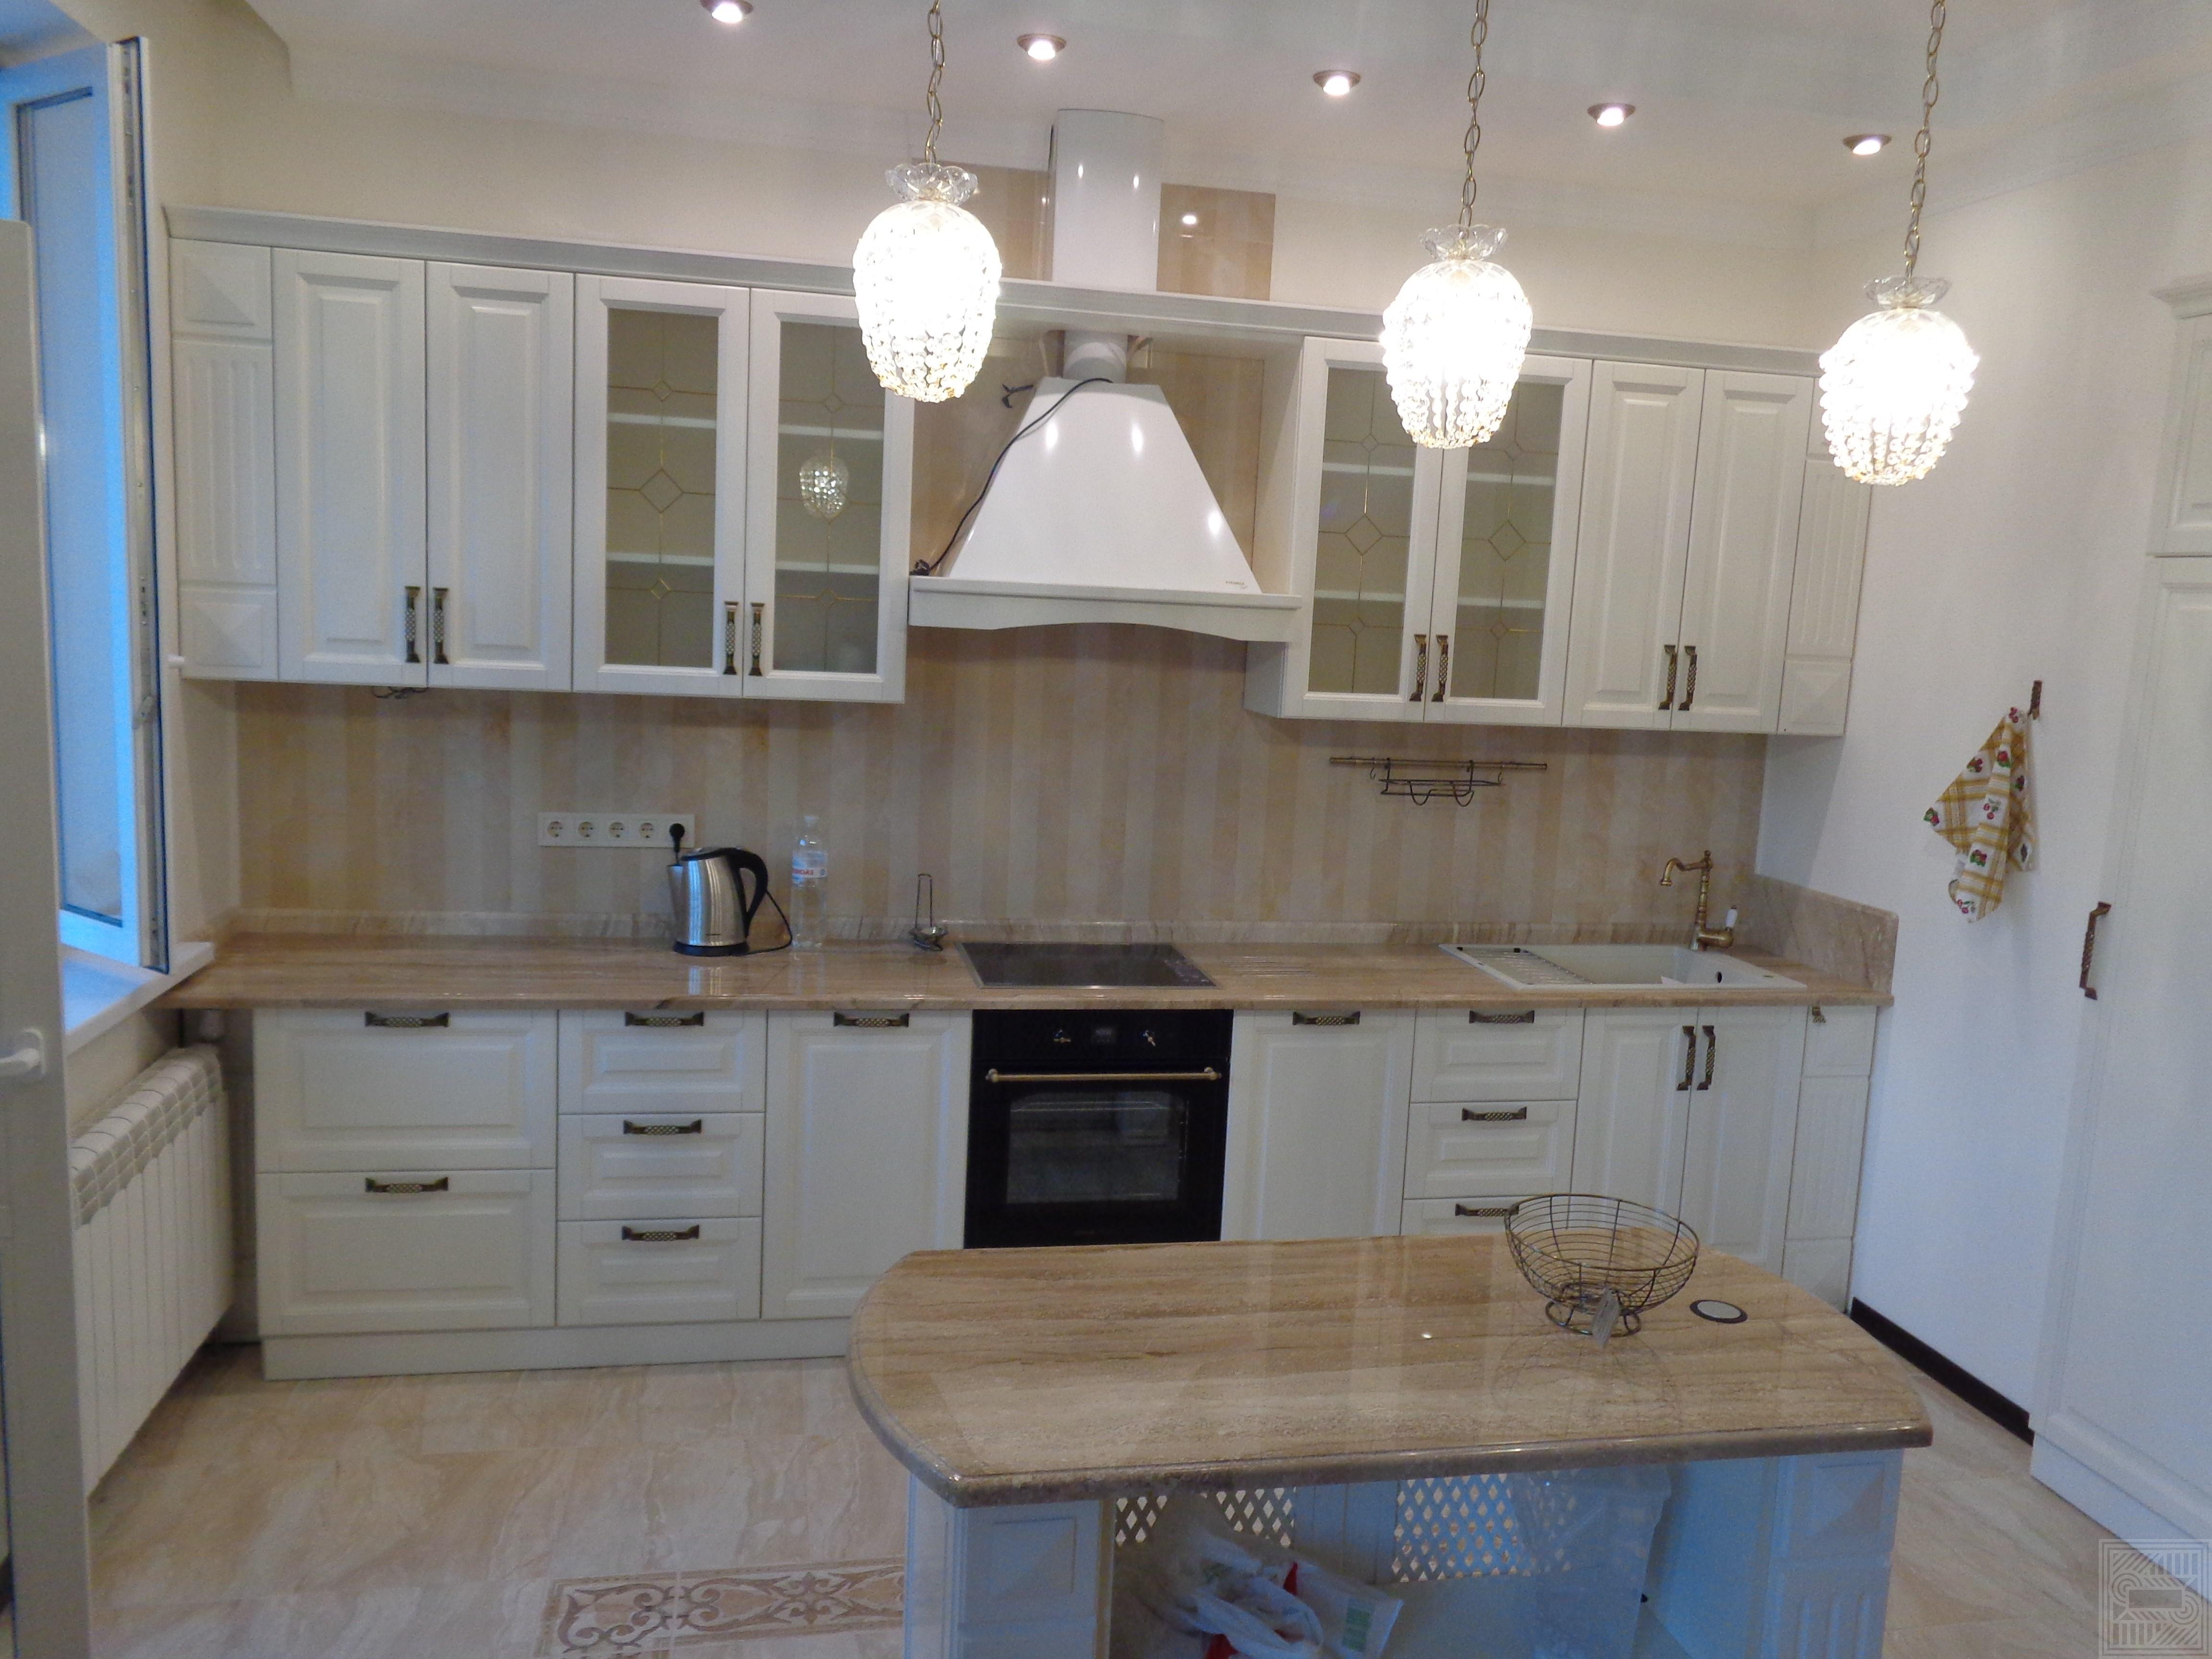 Кухонный комплекс из мрамора Daino desk, worktop-marble - Krasnotkatskaya43 4